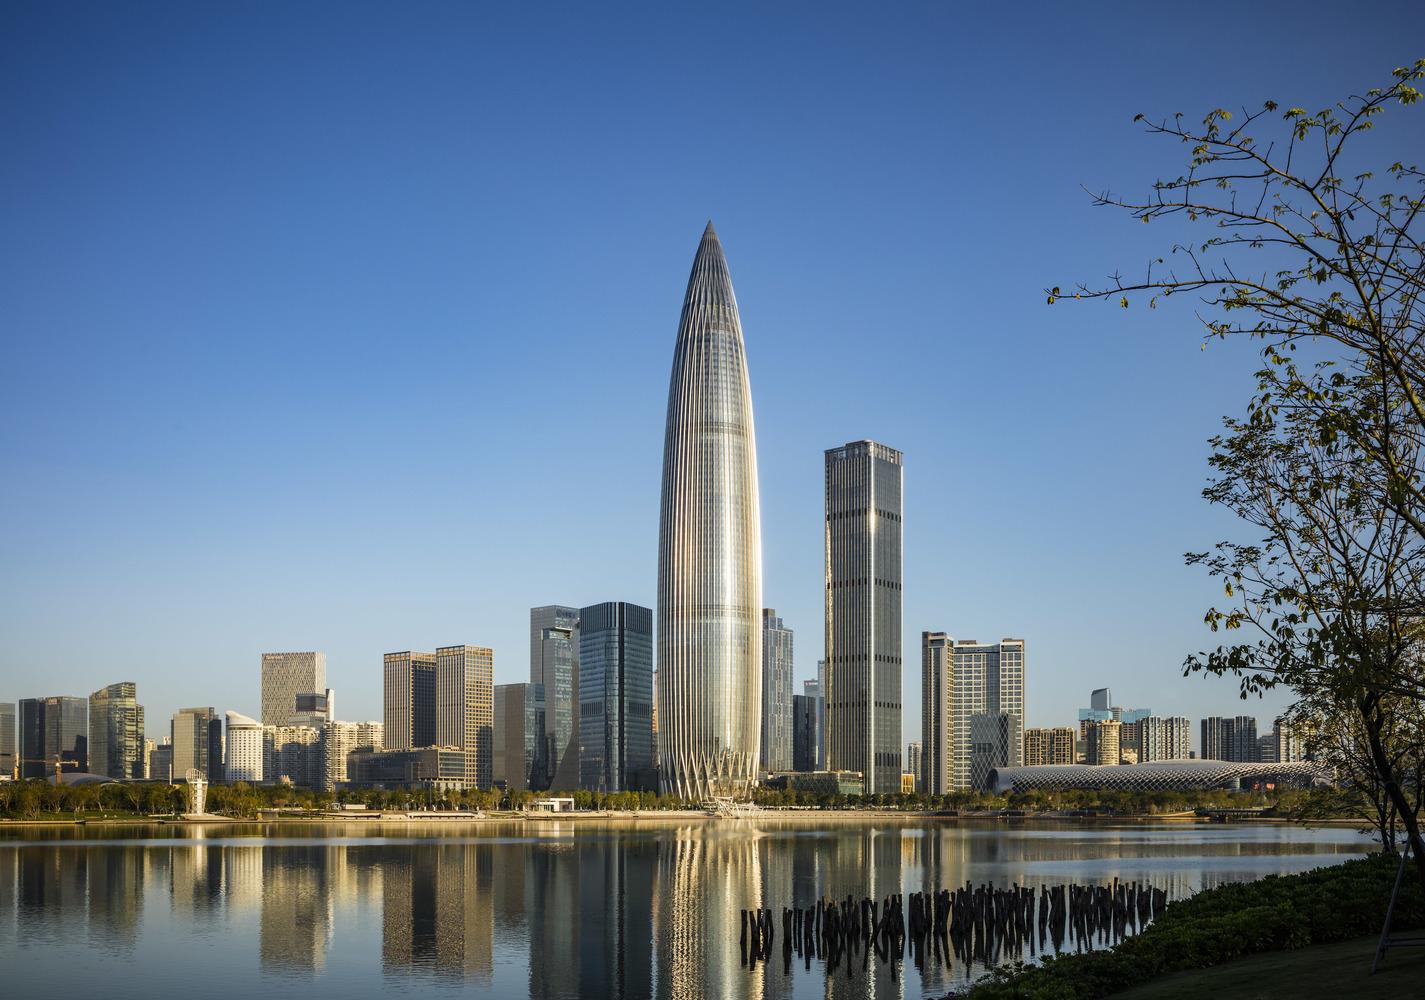 China Resources Headquarters / KPF